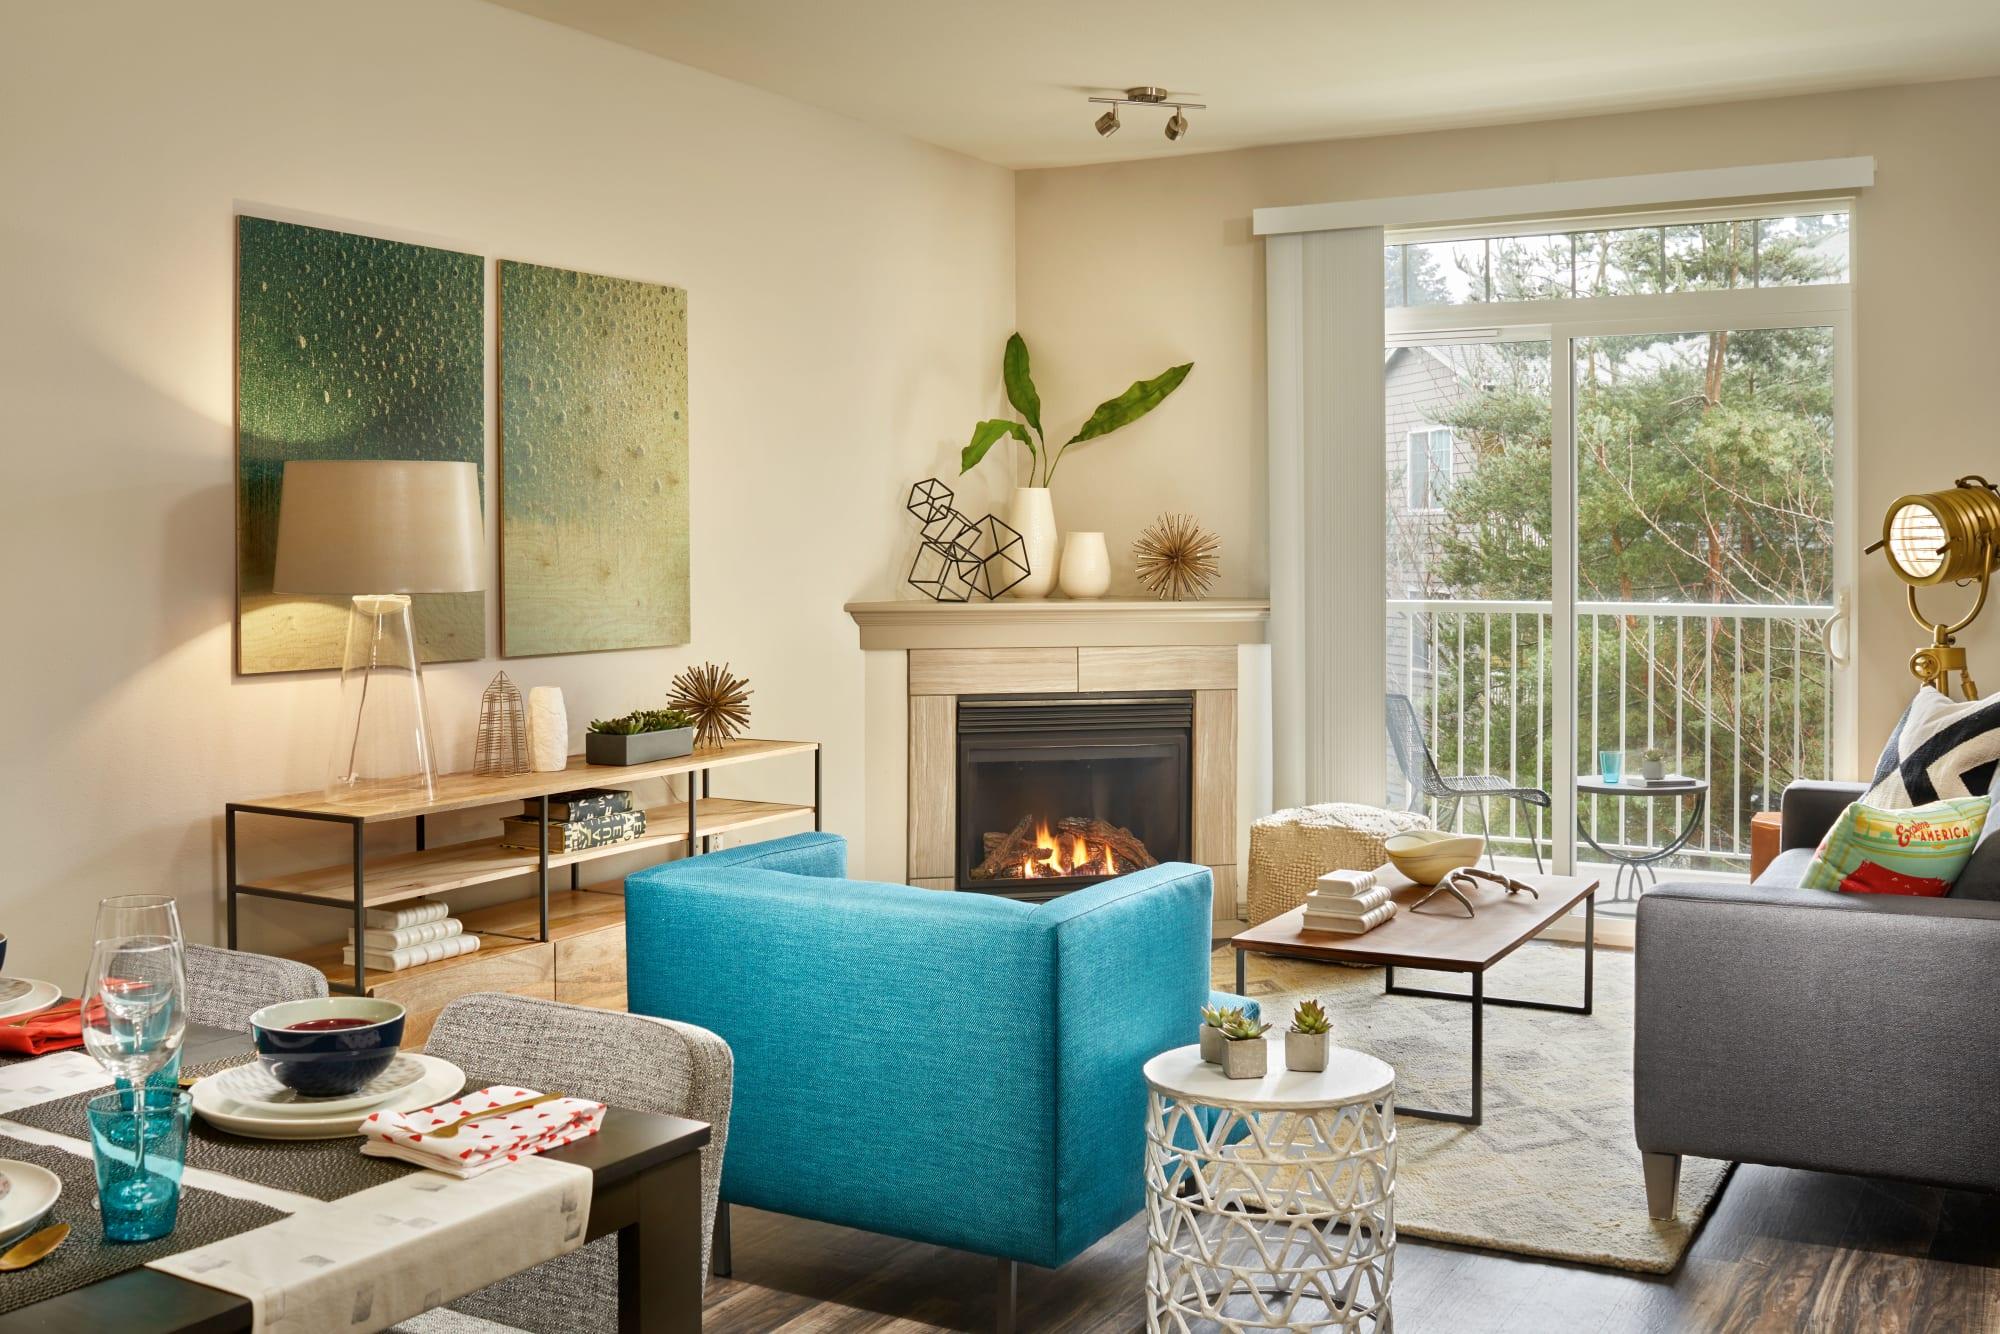 Furnished living room at Brookside Village in Auburn, Washington